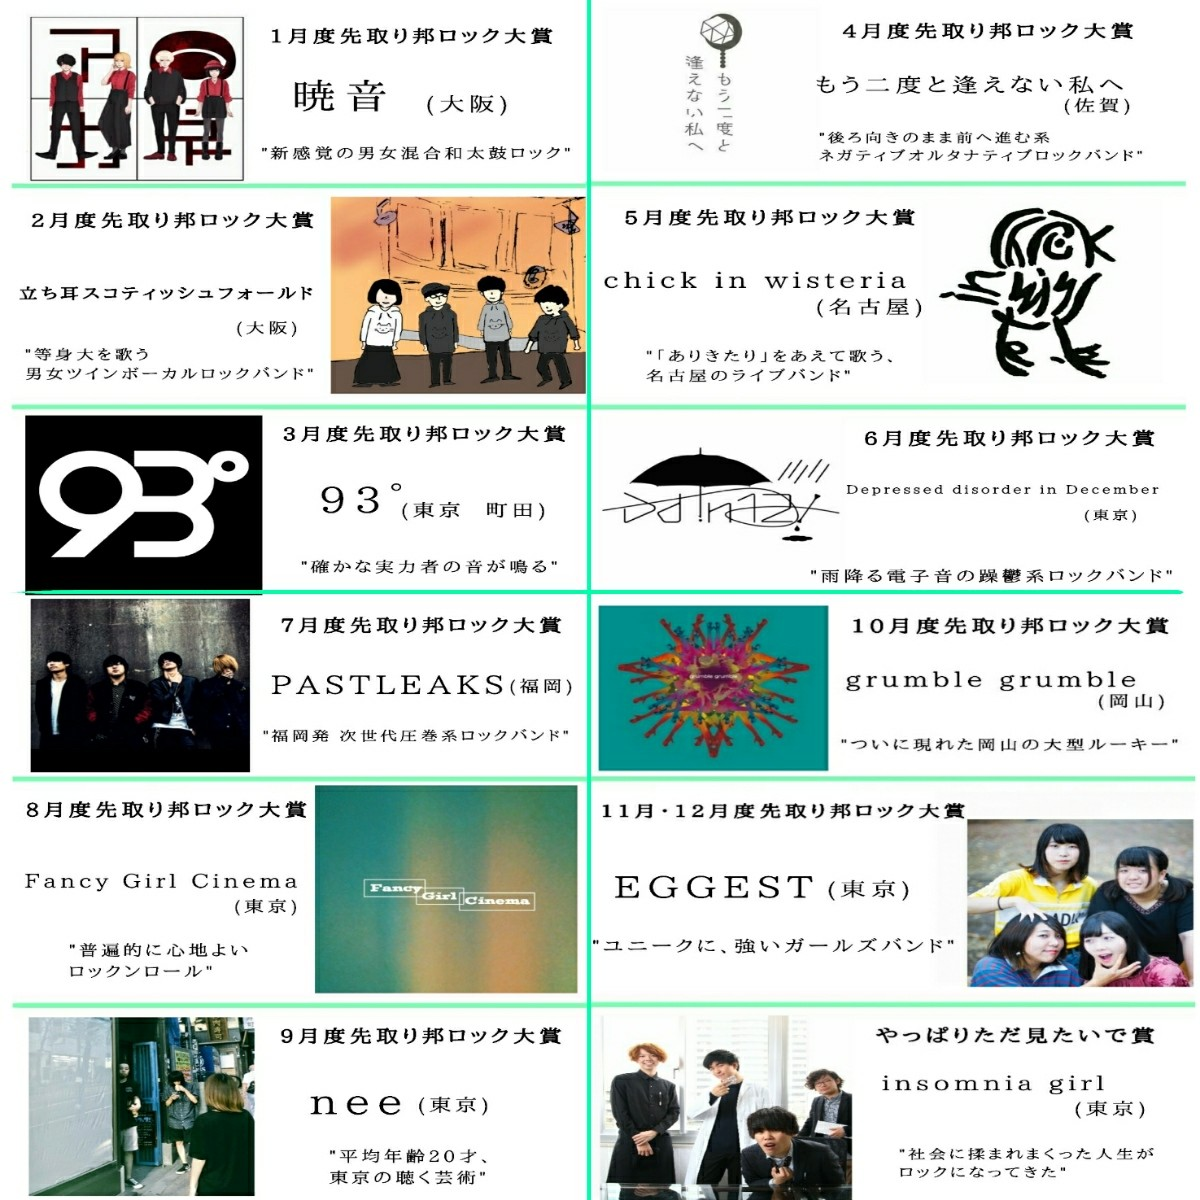 f:id:sakidoriyutsubarock:20181216222450j:plain